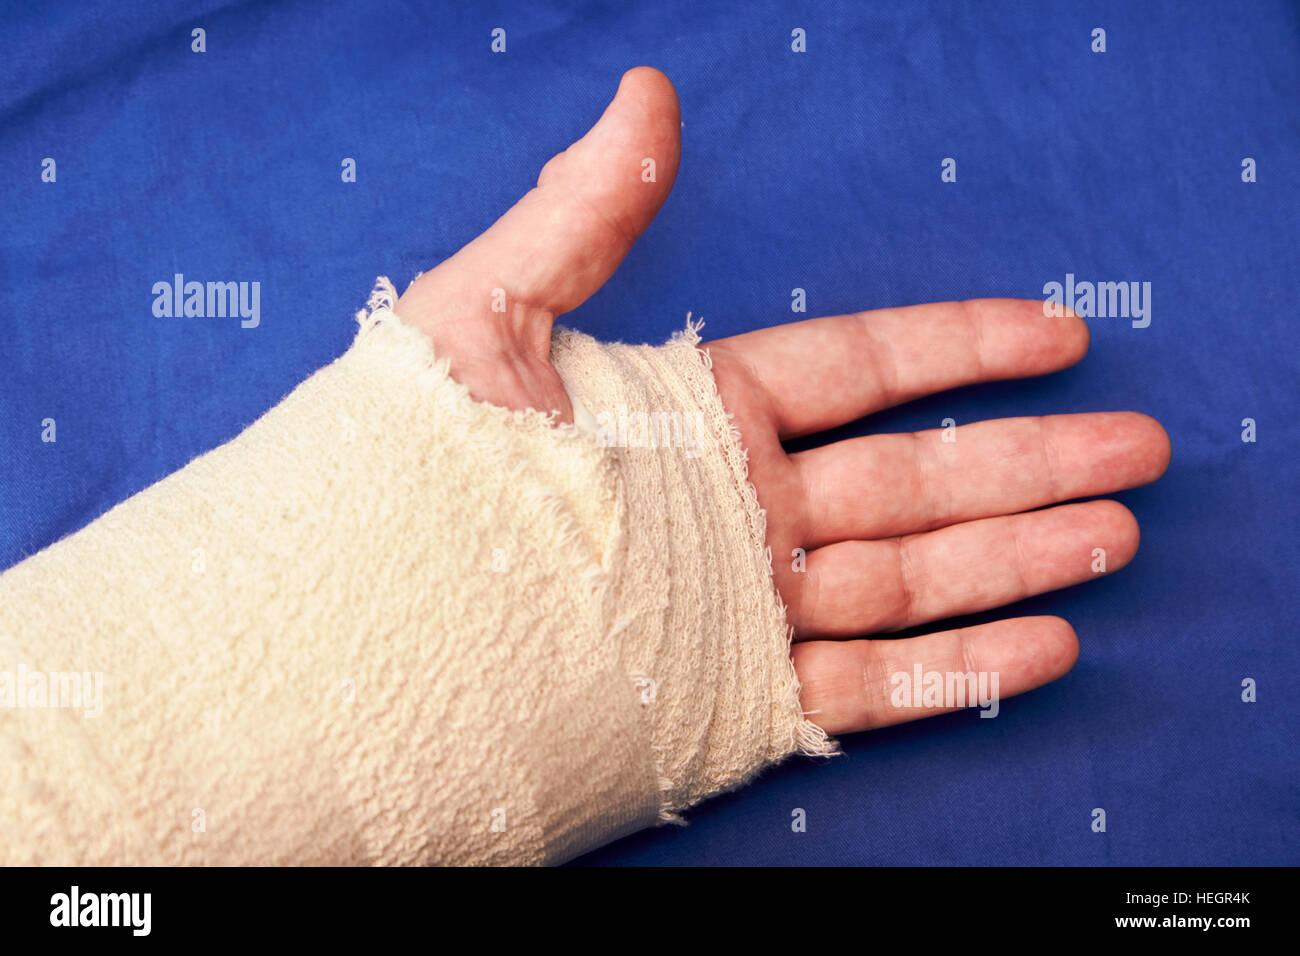 bandaged left hand after carpal tunnel injury surgery - Stock Image